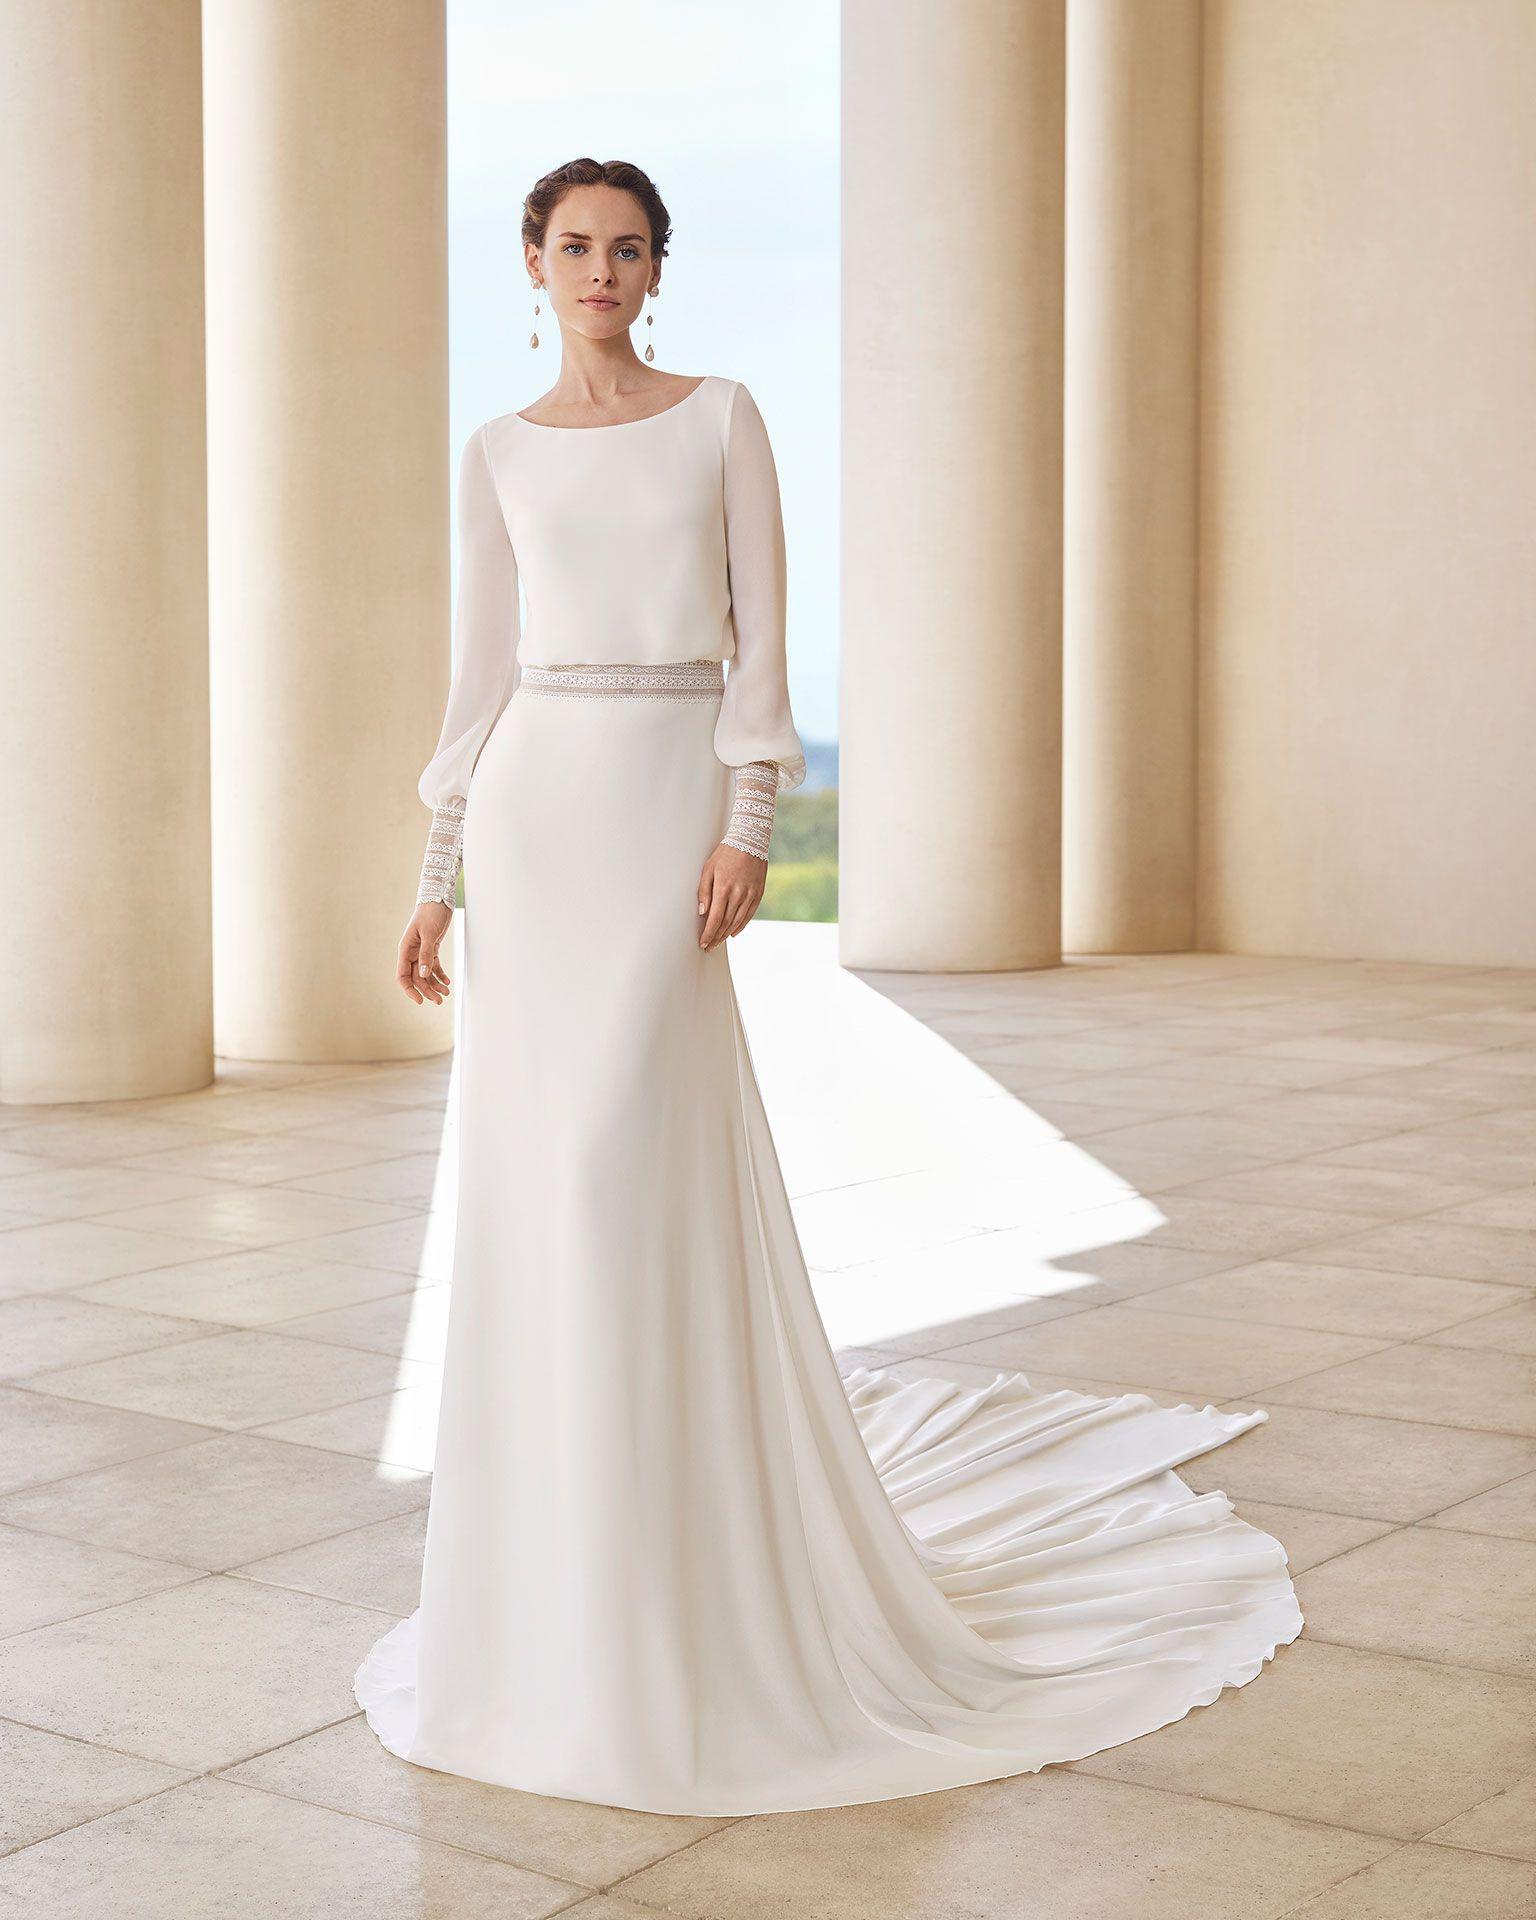 Sahel Bridal 2020 Rosa Clara Couture Collection Muslim Wedding Dresses Wedding Dress Long Sleeve Bridal Dresses